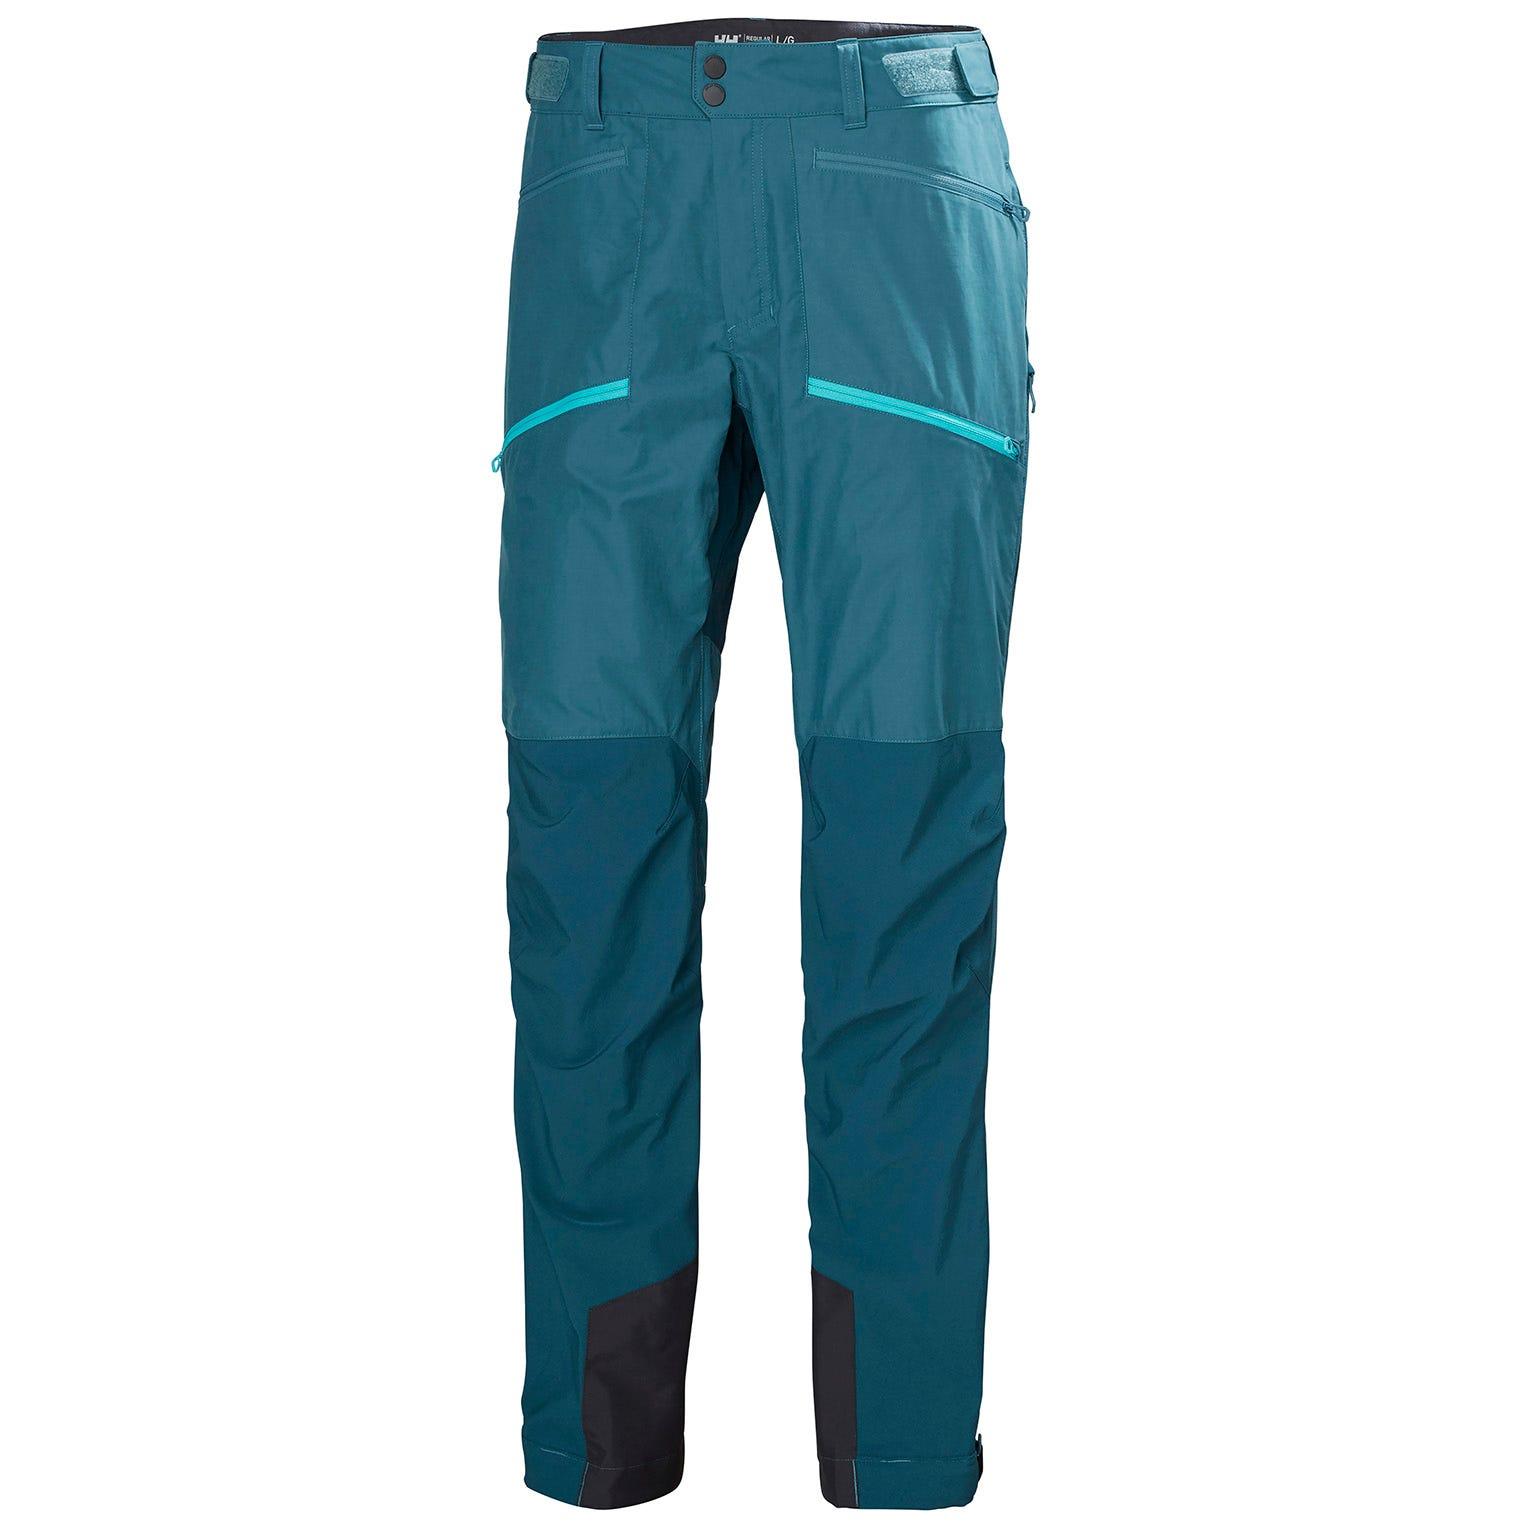 Helly Hansen Mens Verglas Tur Durable Hiking Trousers XL